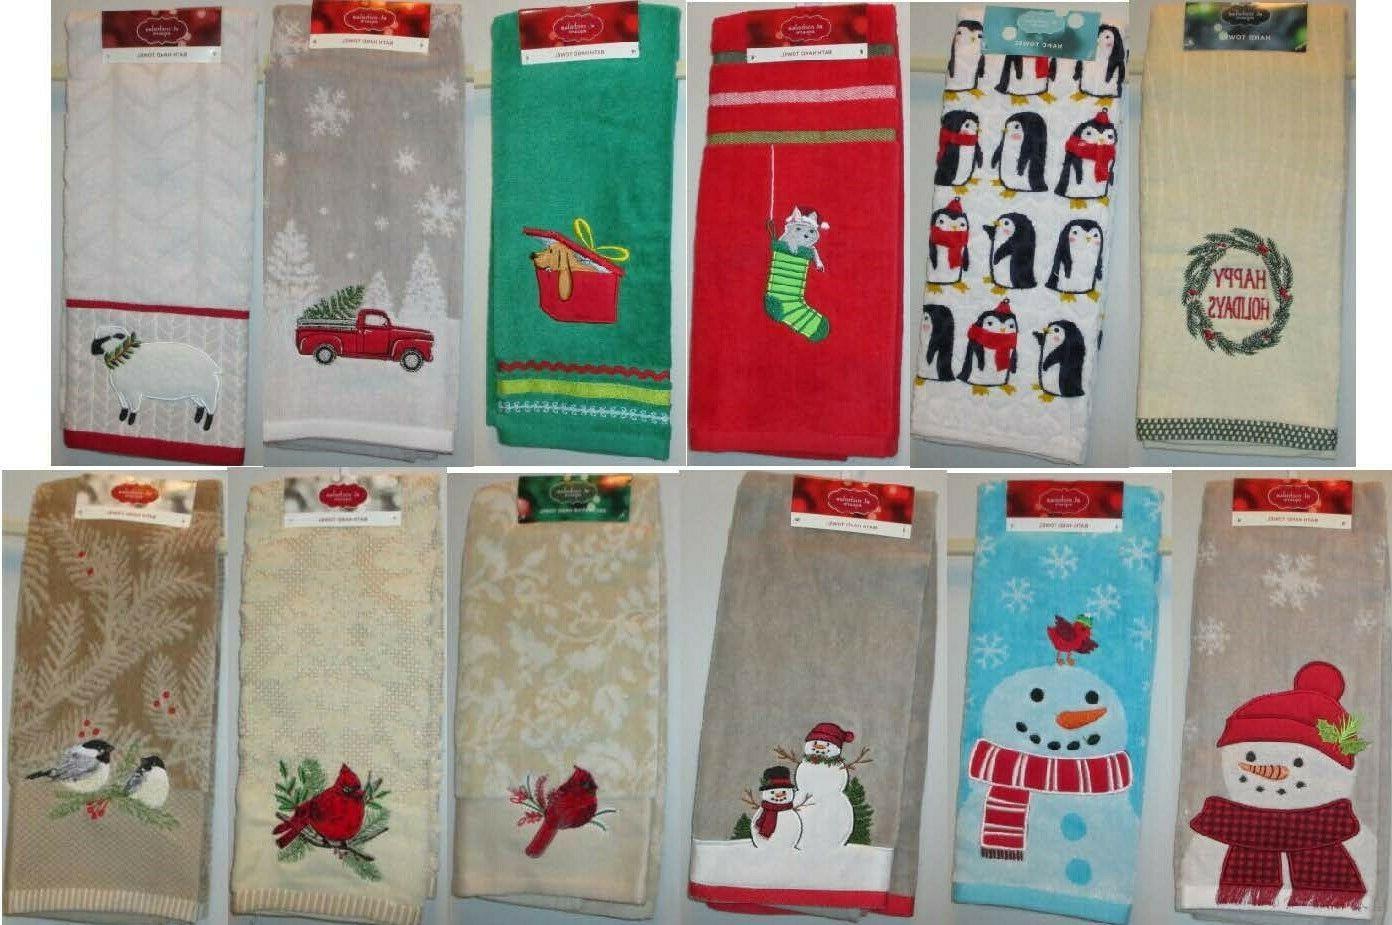 Decorative Hand Towels Holidays Beach Fall Winter NWT 76